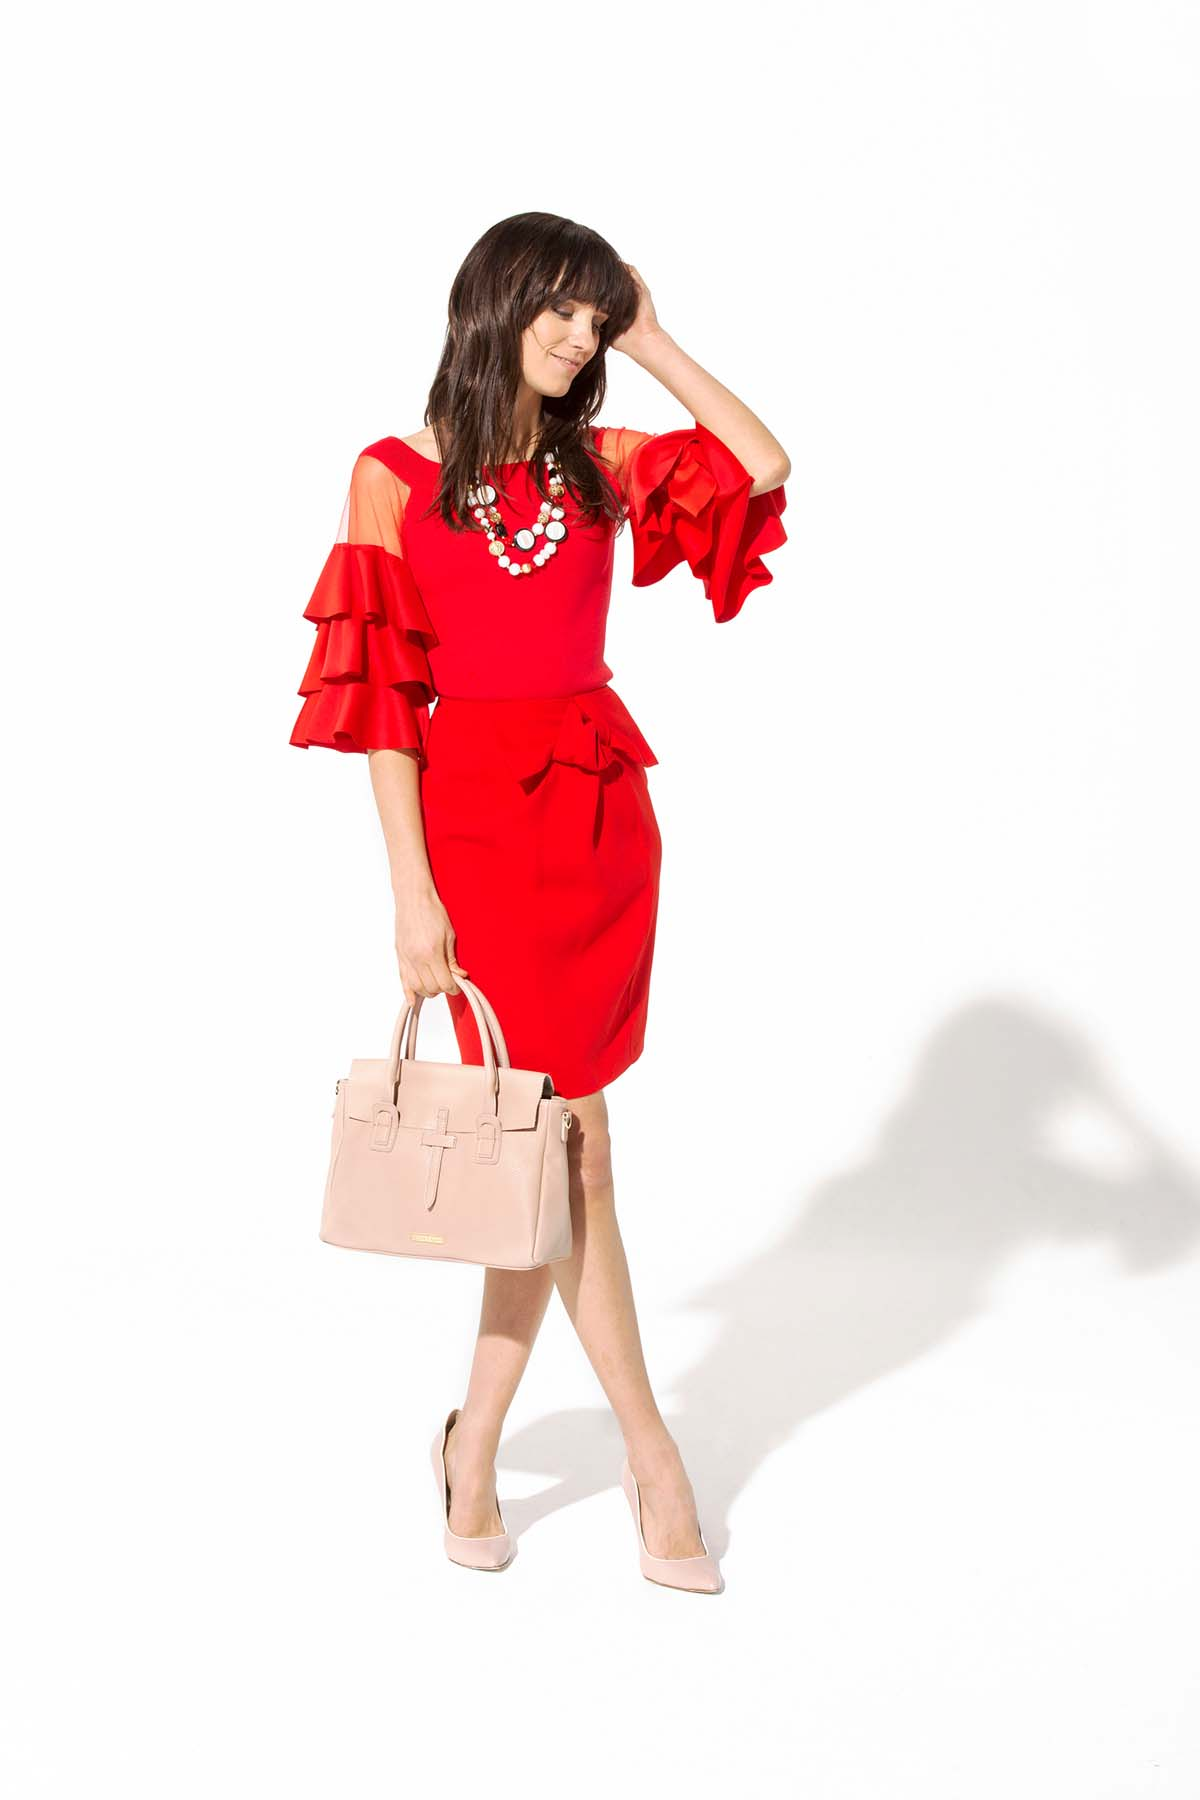 Teria Yabar - Jersey rojo de volantes